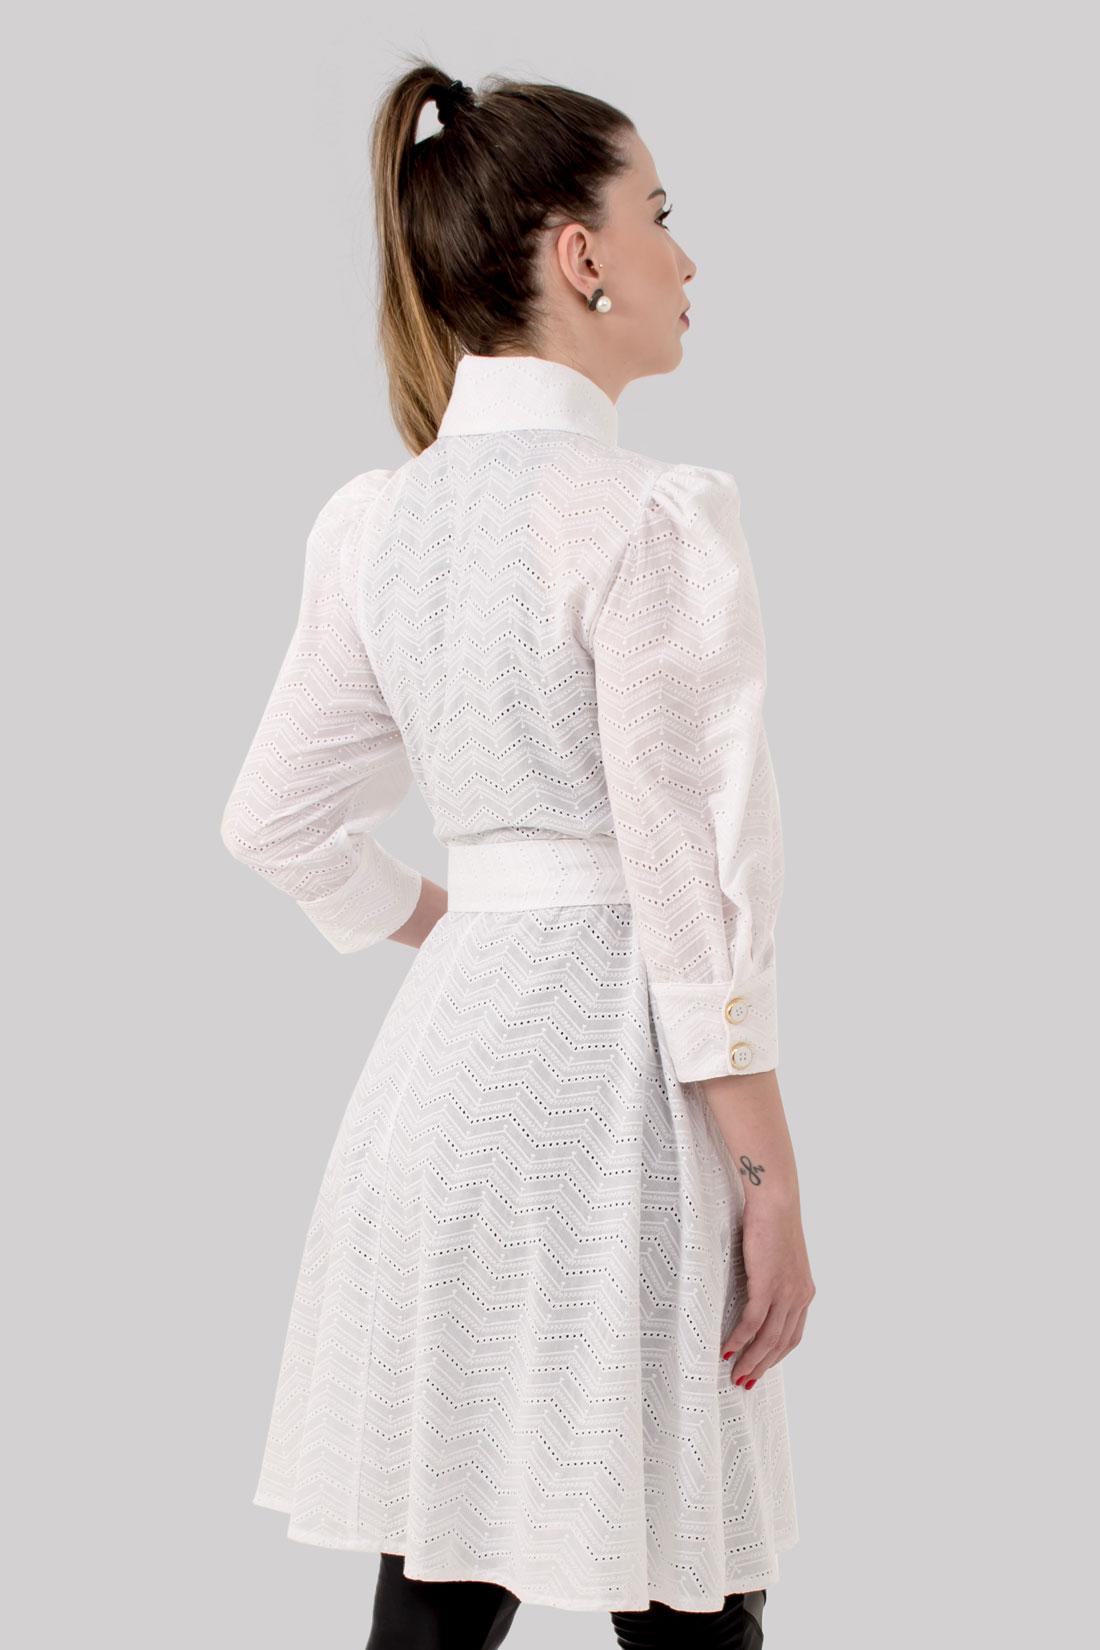 JALECO  JULIA  - Luxo Branco - Jalecos Personalizado Feminino